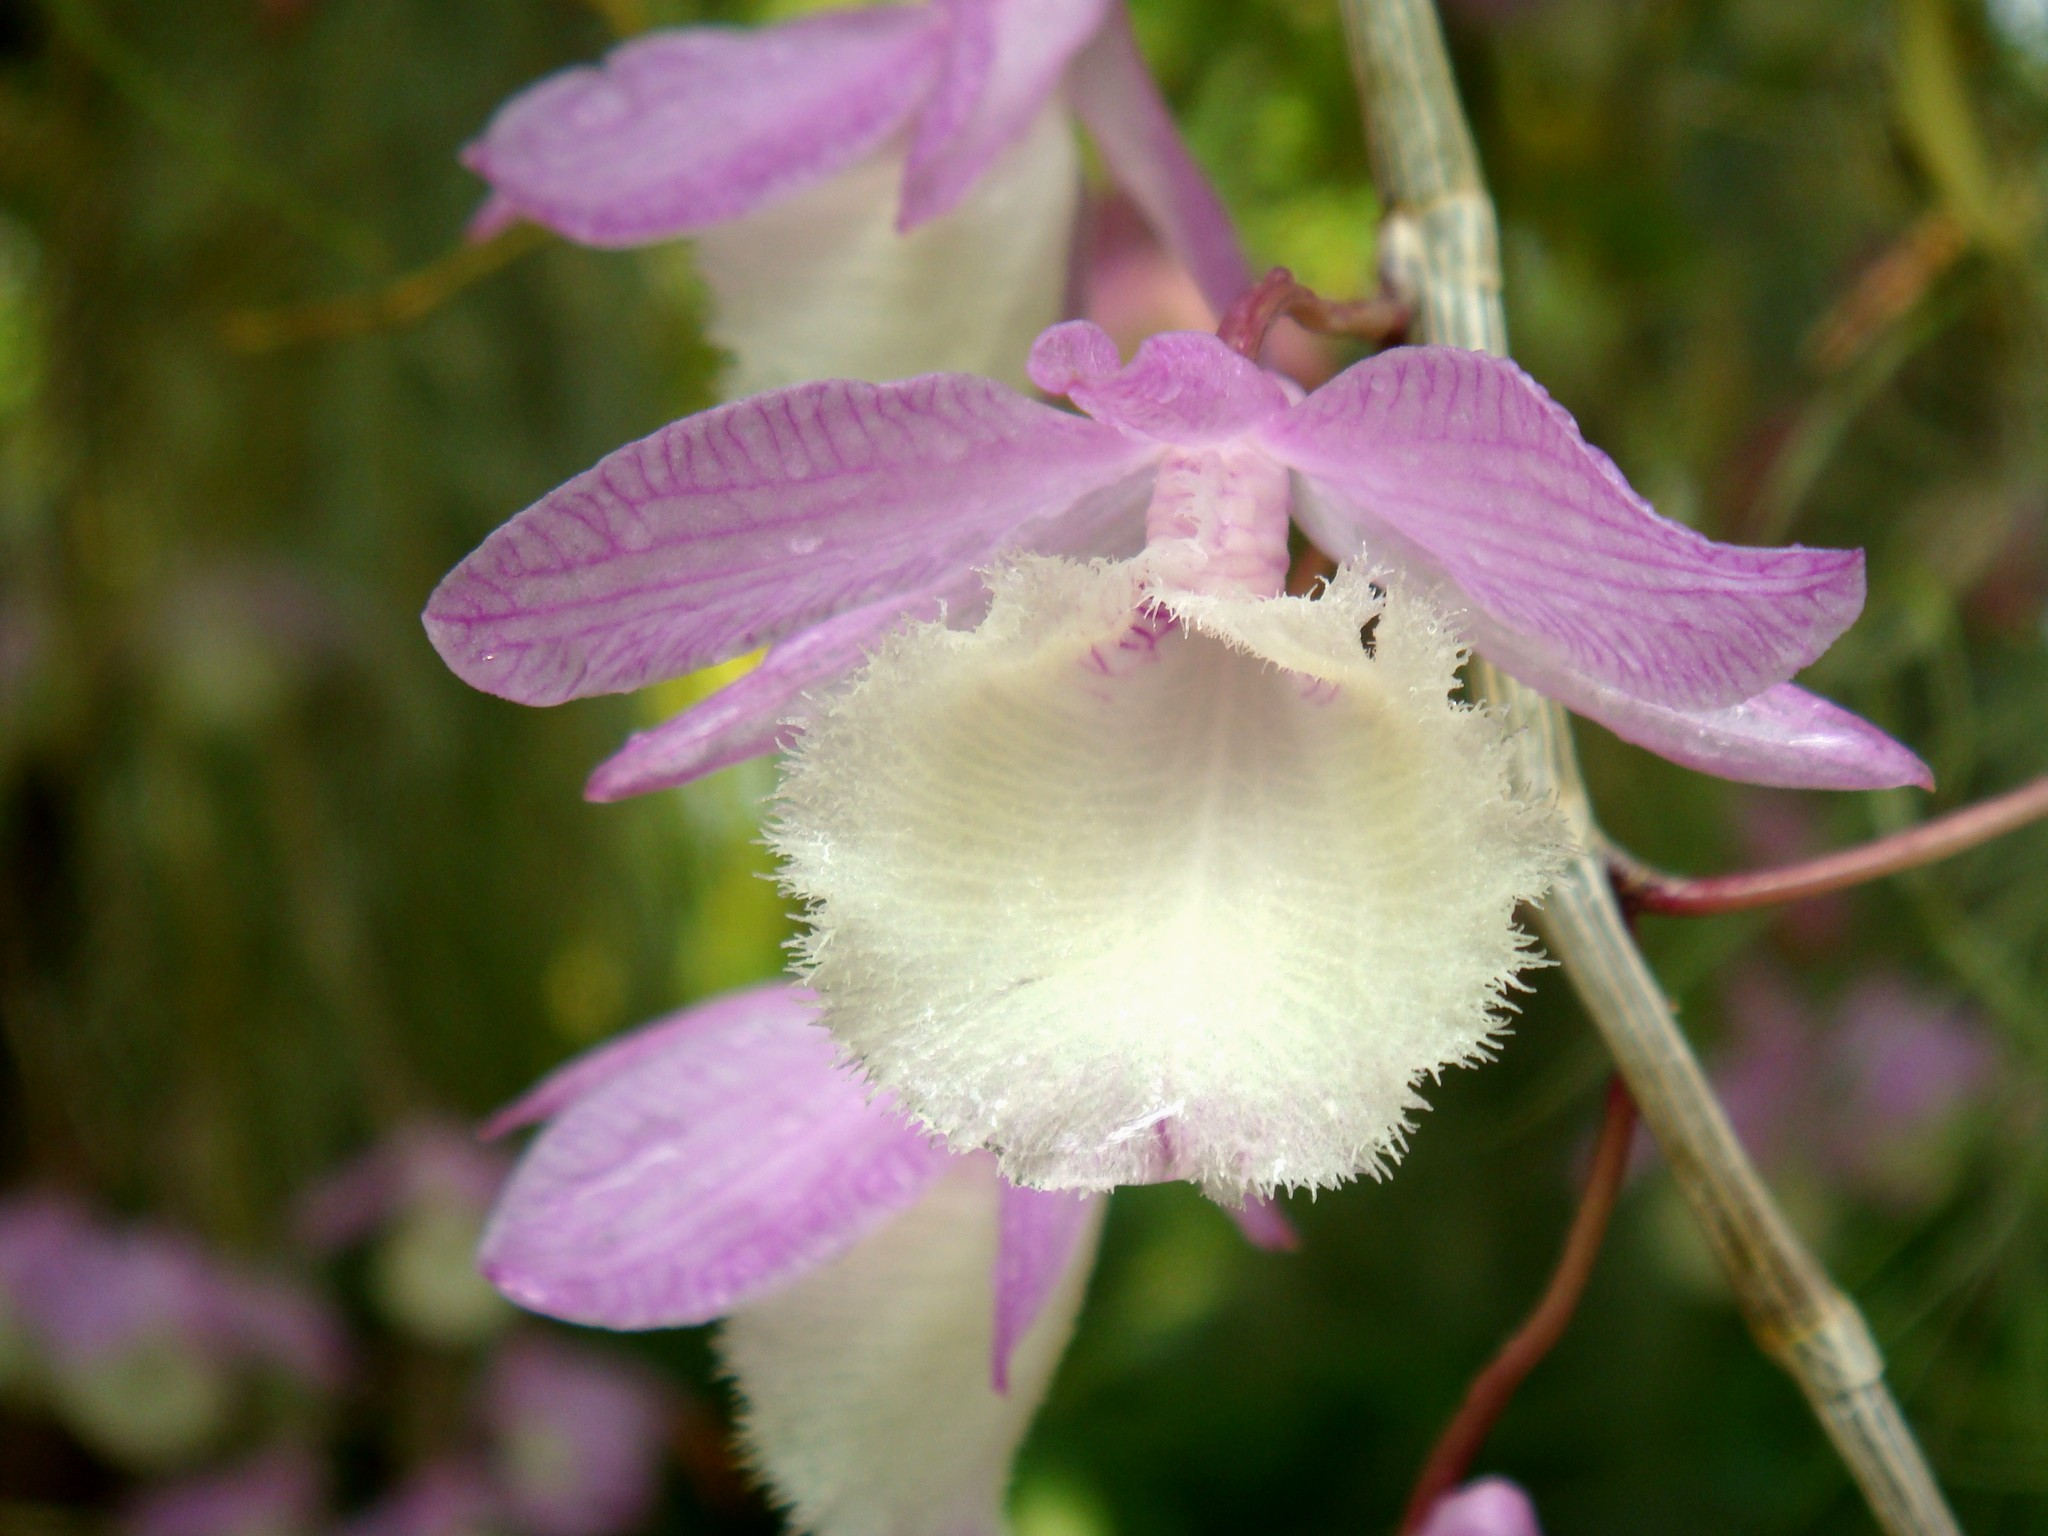 http://orchids.la.coocan.jp/Dendrobium/Dendrobium%20aphyllum/DSC05477.JPG